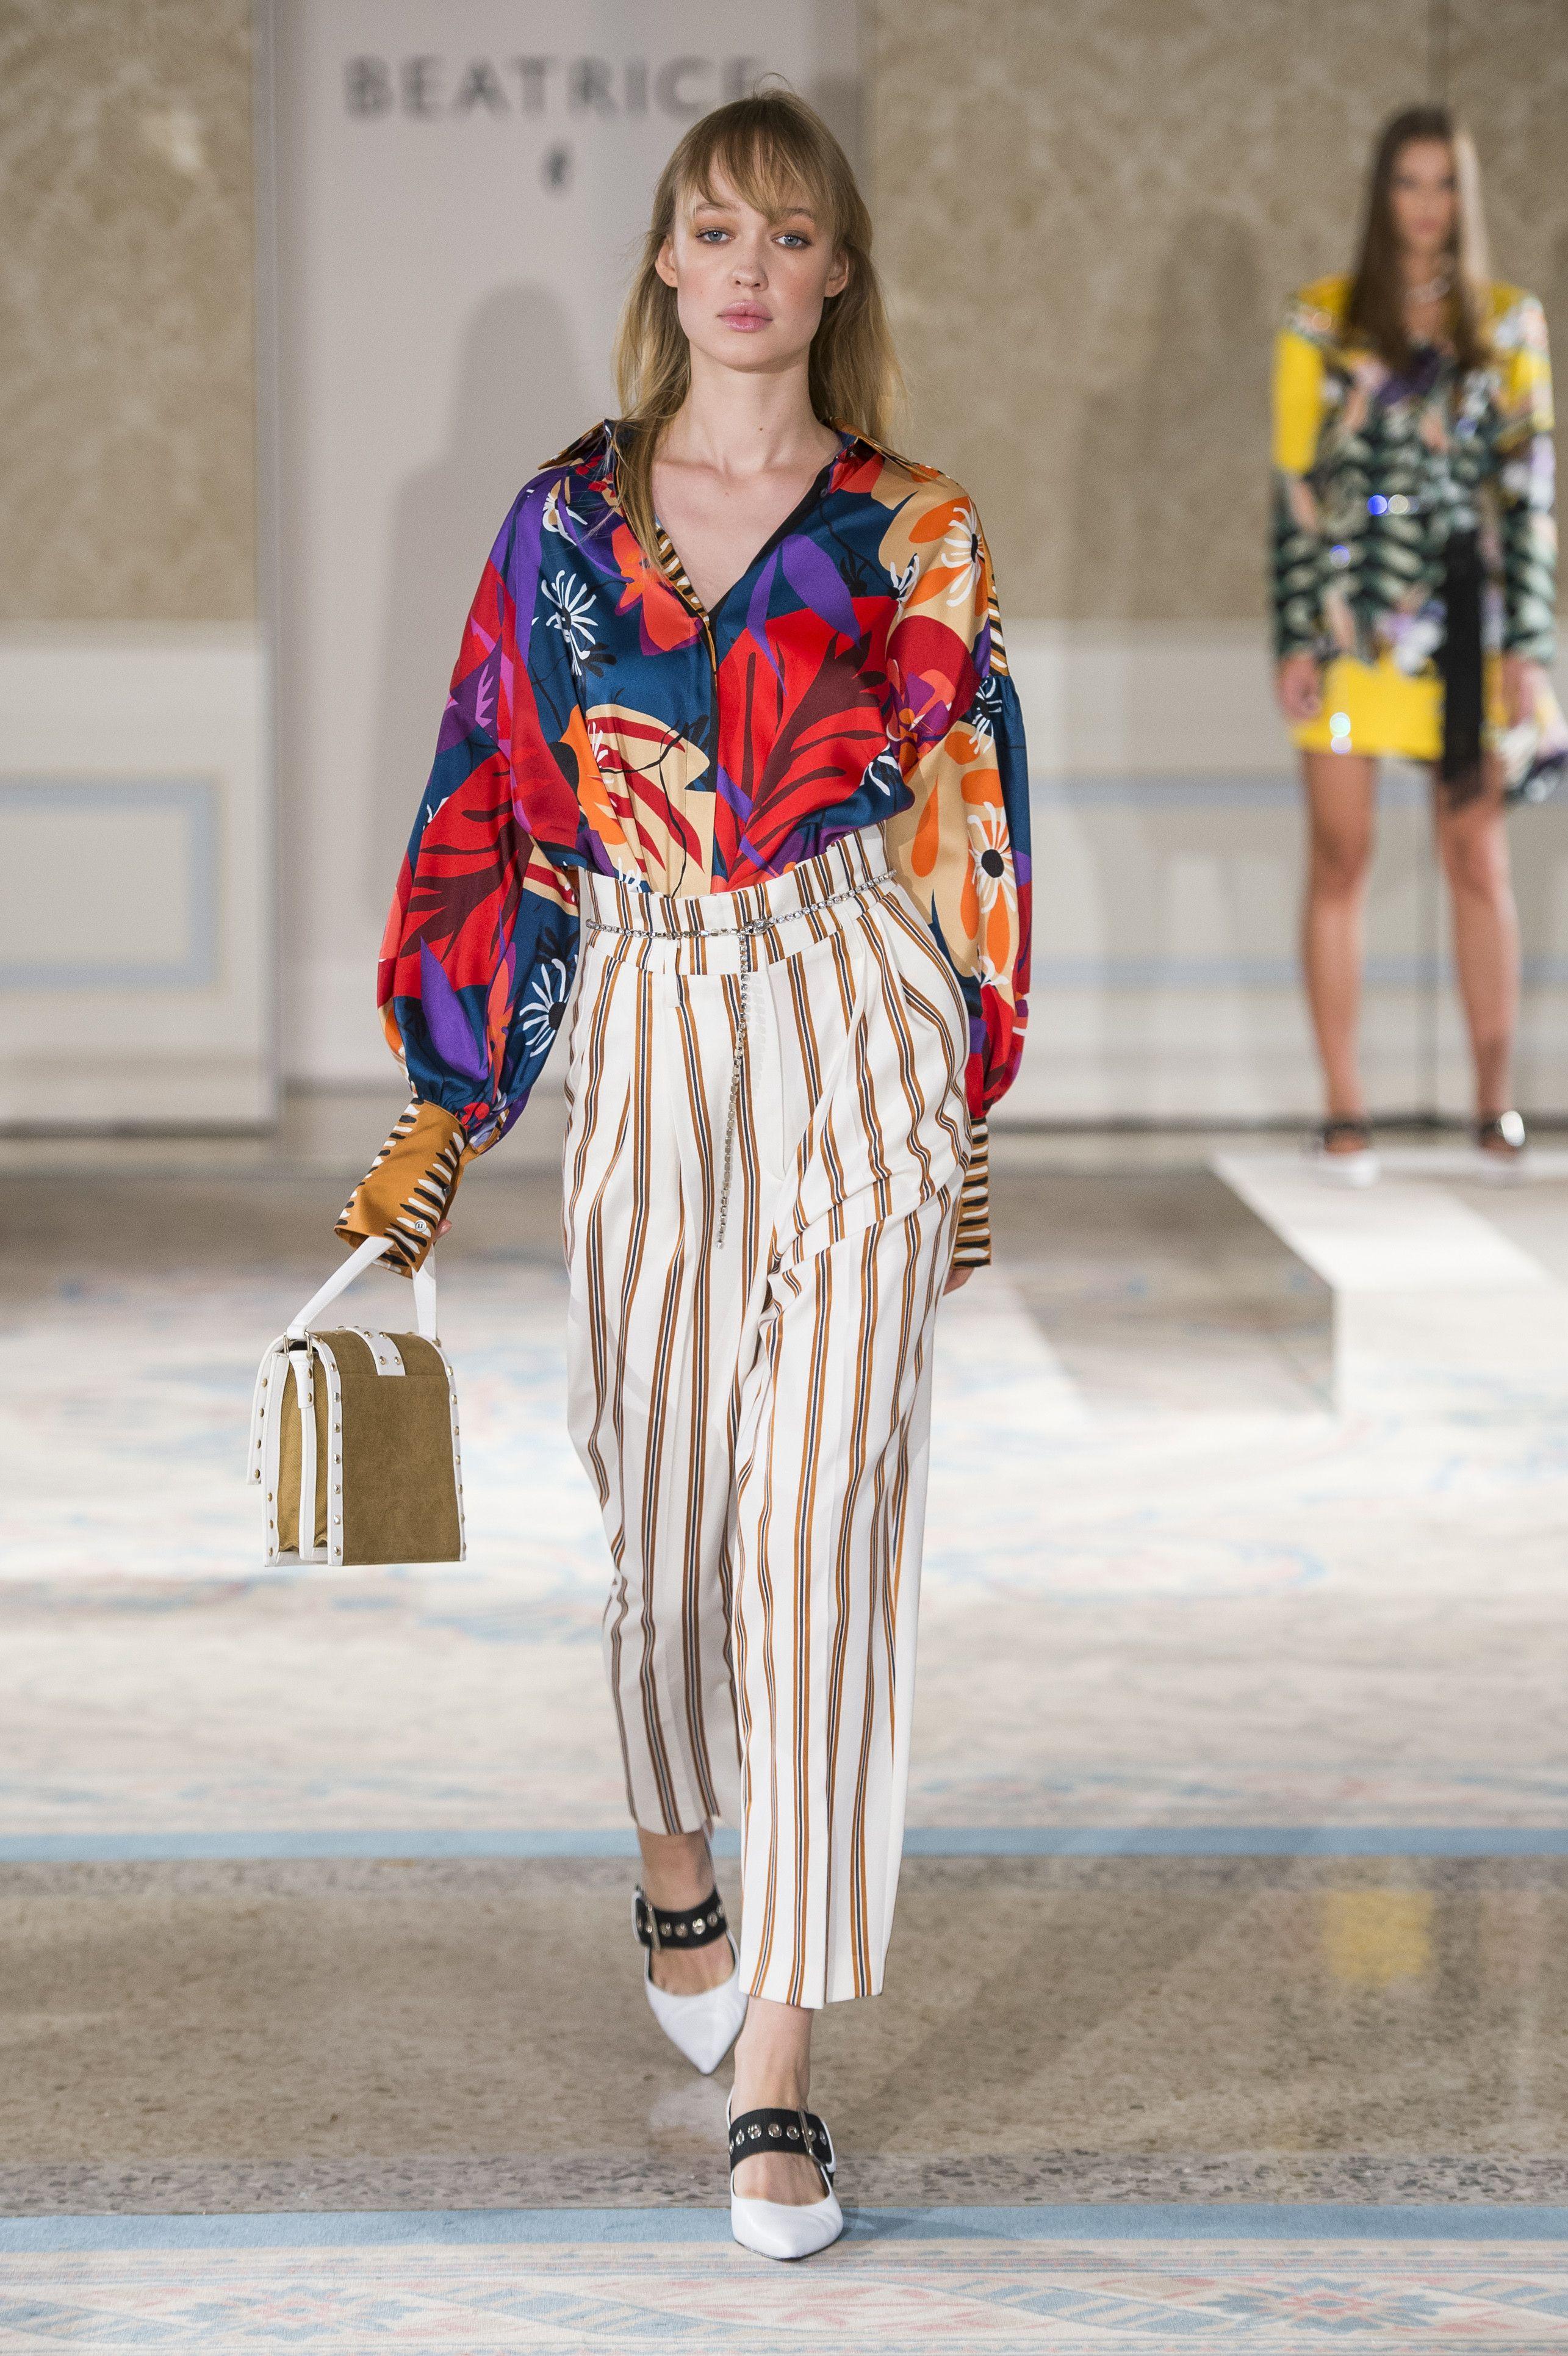 Beatrice B | Milan Fashion Week SS 19 | Fashion, Fashion